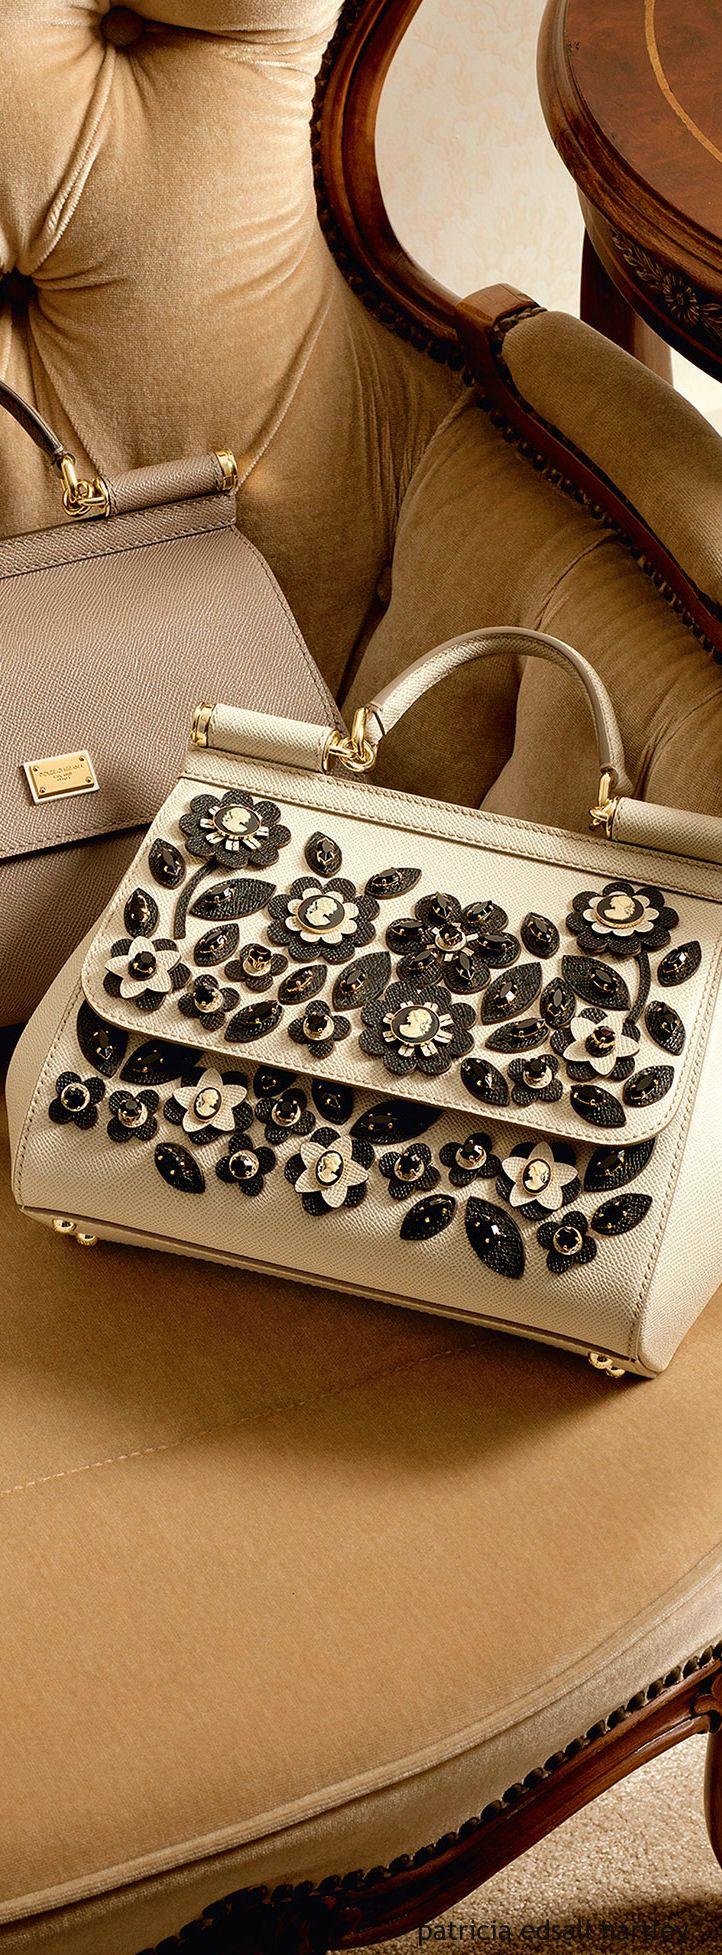 Dolce & Gabbana ~ Winter White Leather Embellished Satchel 2016